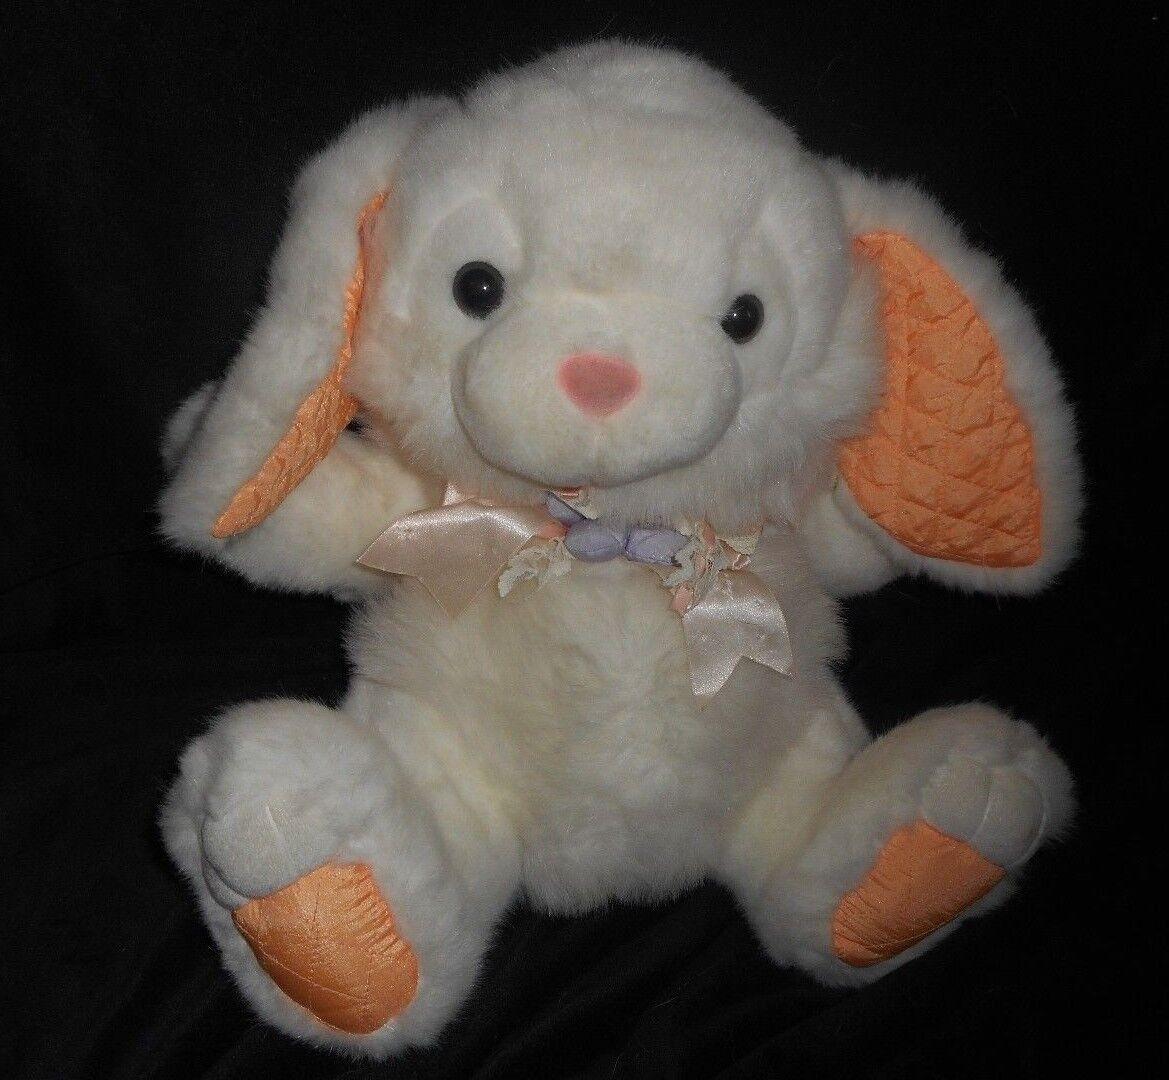 VINTAGE K-MART FAIRVIEW WHITE & orange BUNNY RABBIT STUFFED ANIMAL PLUSH TOY